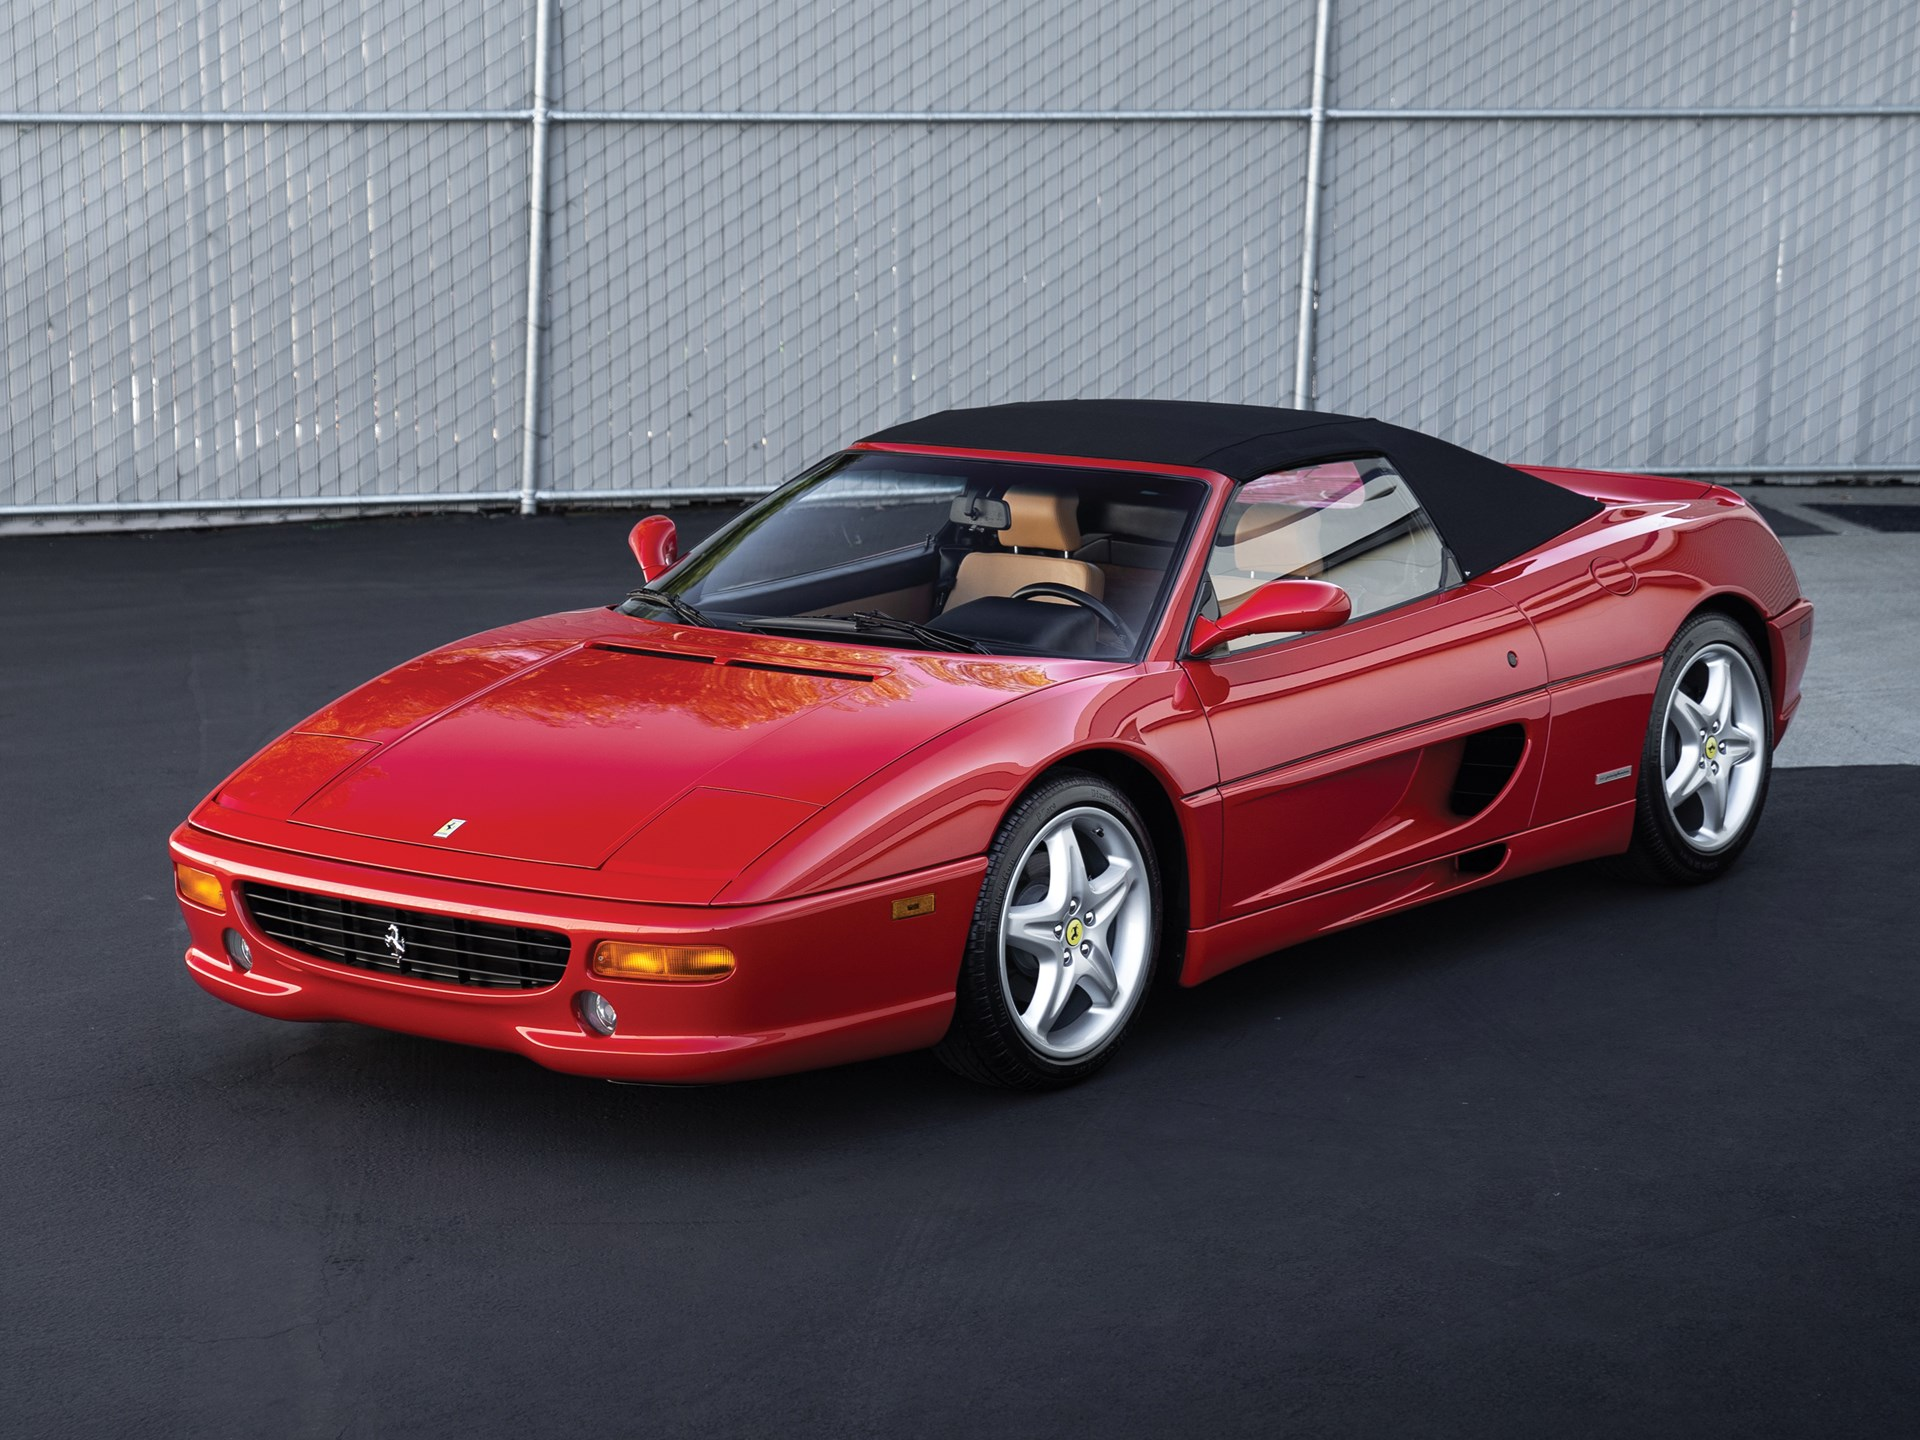 Ming Collection 1997 Ferrari F355 Spider